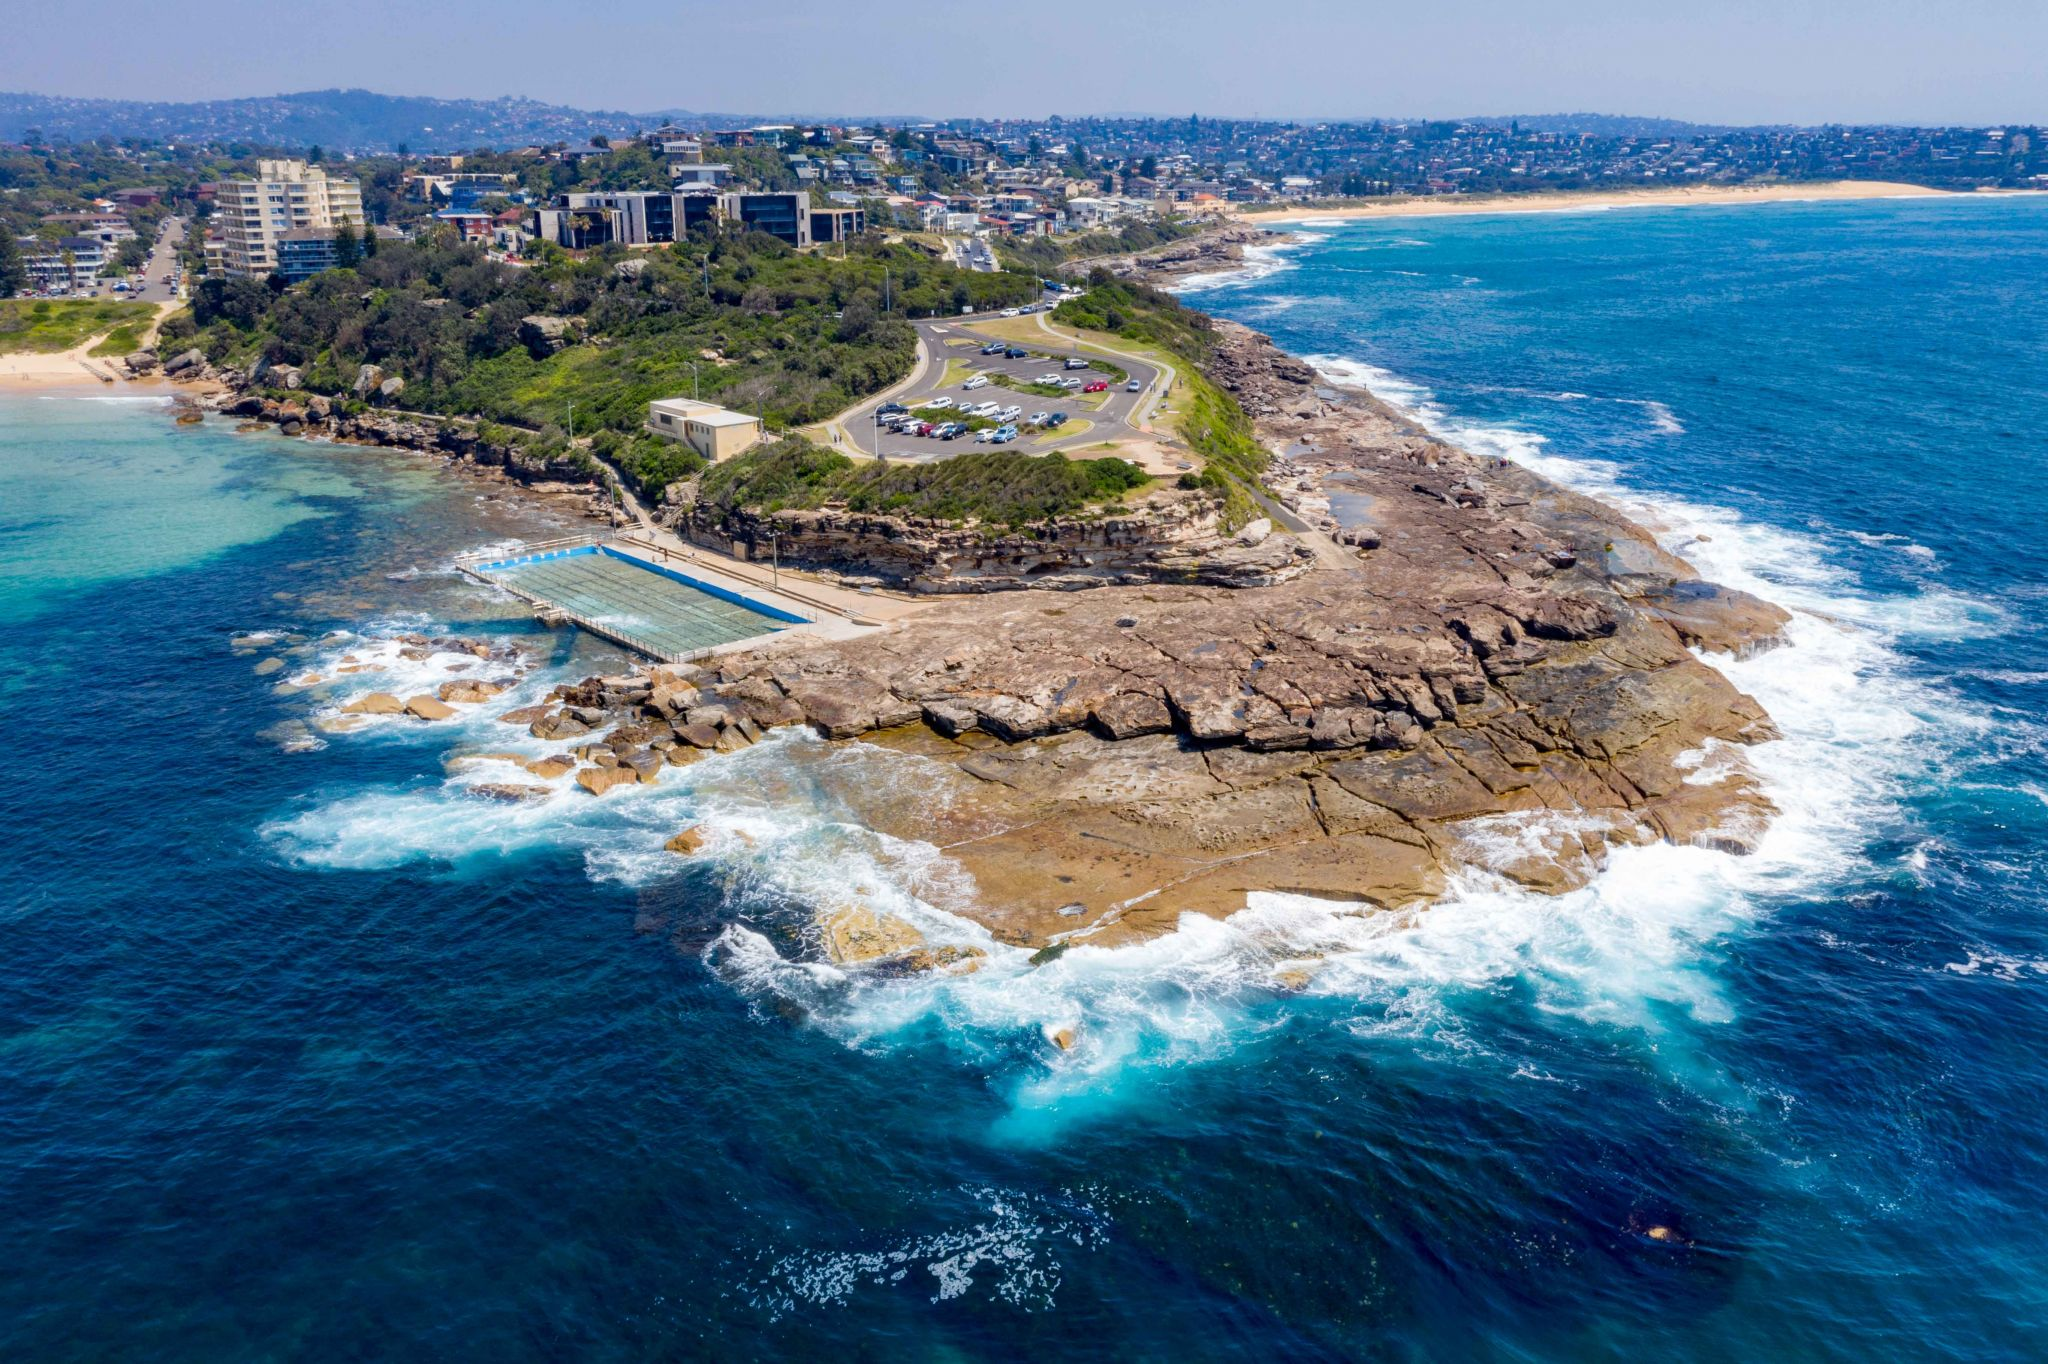 Freshwater Ocean Pool and headland Sydney New South Wales, Australia